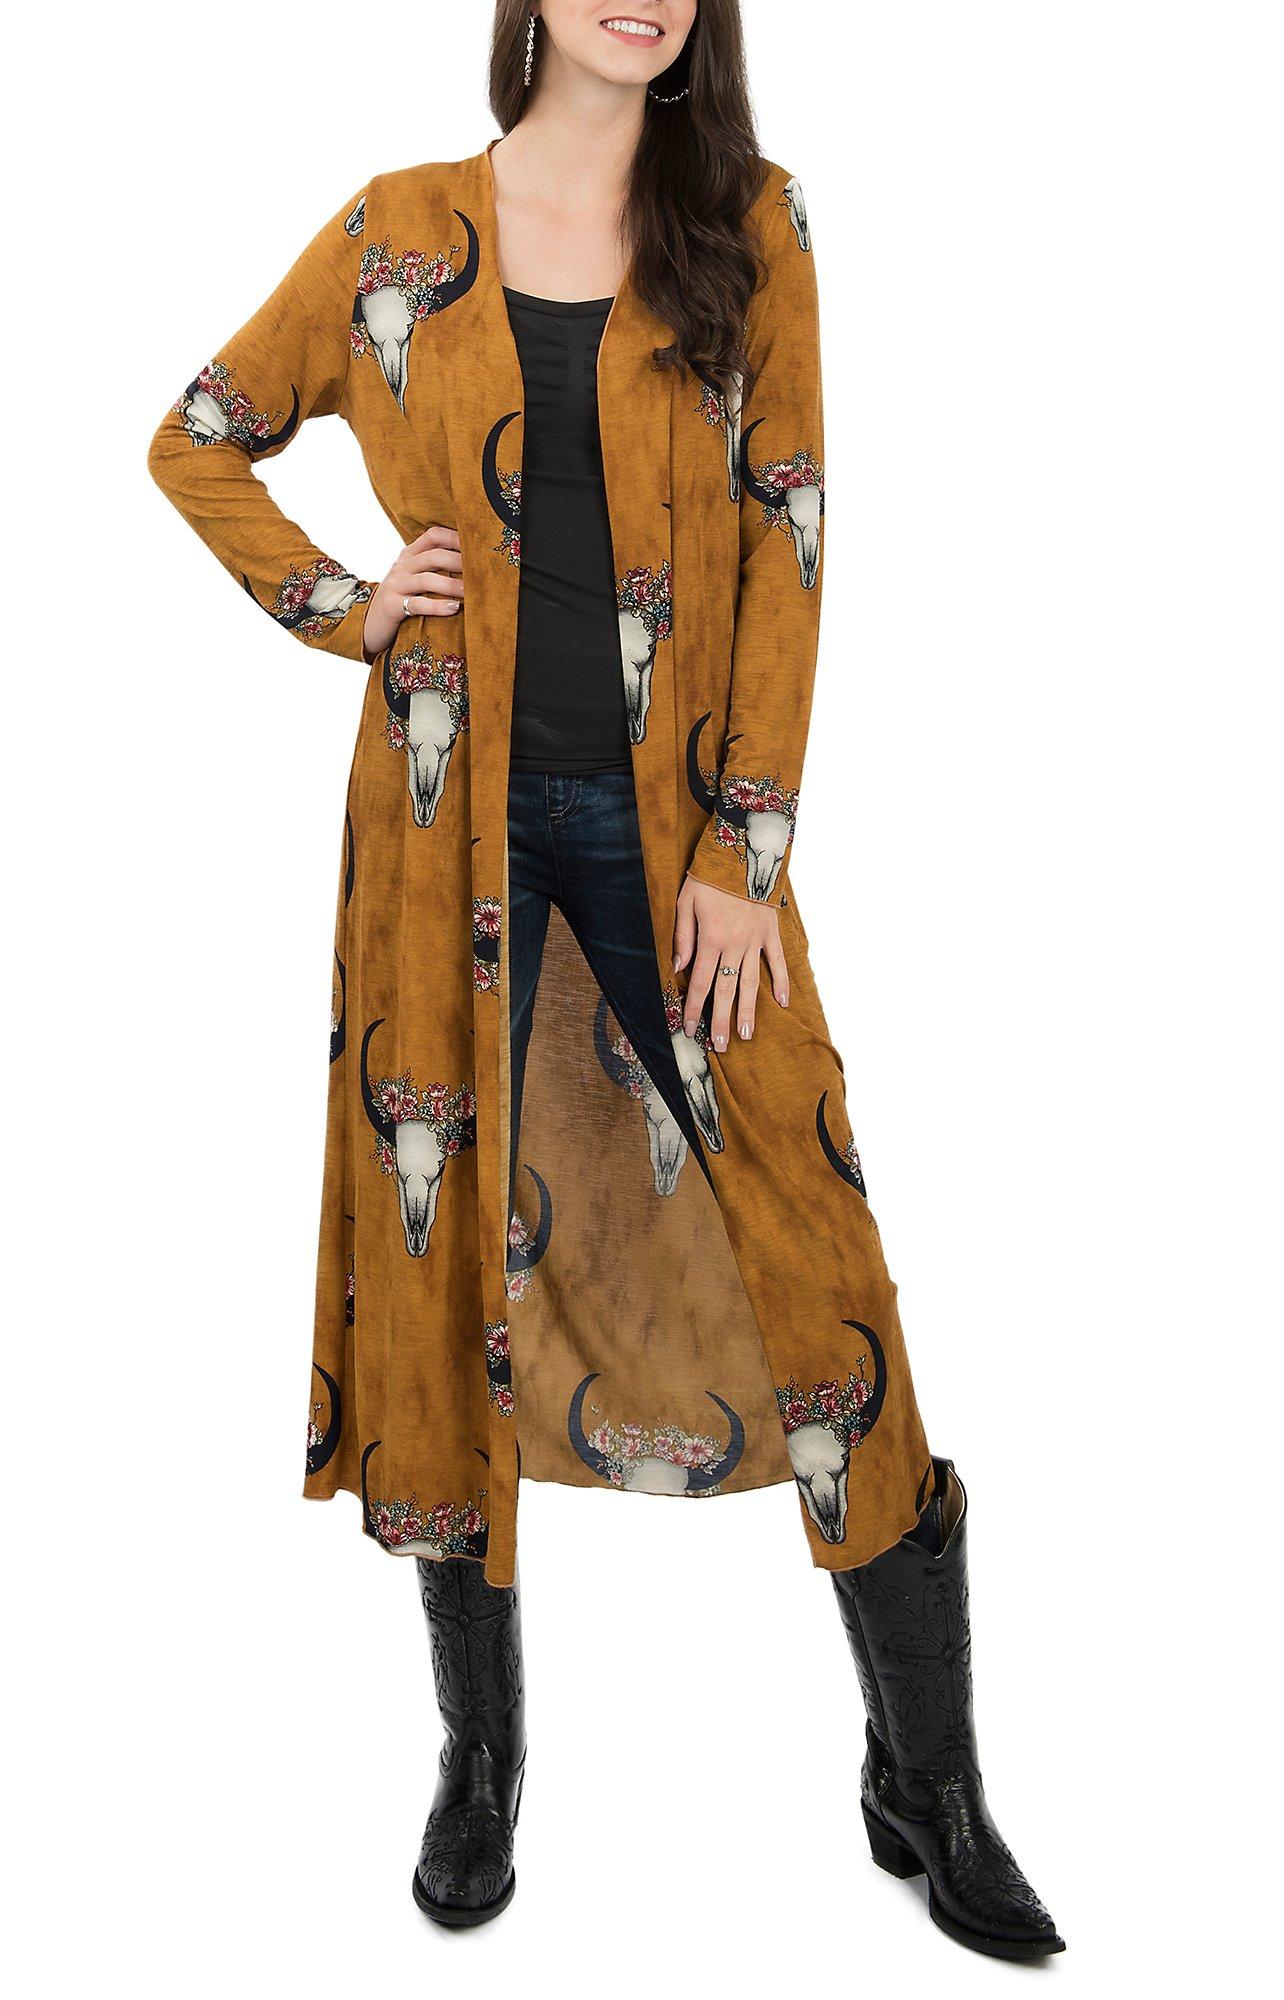 shop plus size western shirts for women | free shipping $50+